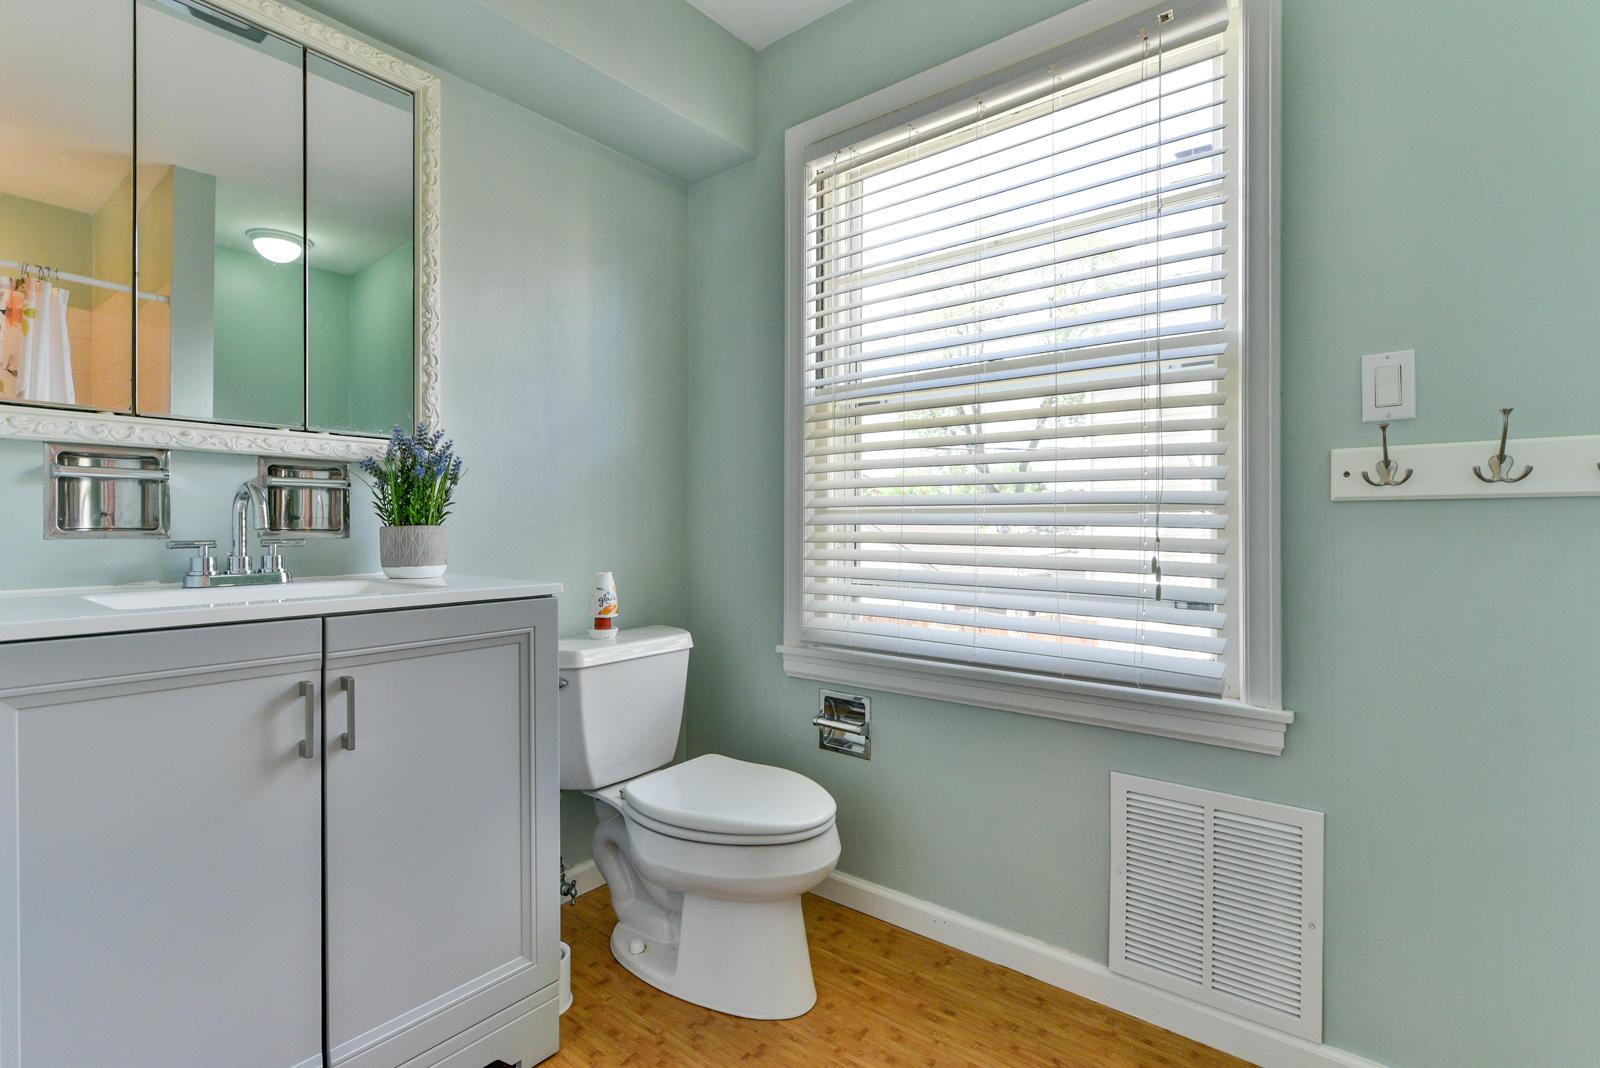 5509 Santa Monica Blvd, Whitefish Bay, Wisconsin 53217, 4 Bedrooms Bedrooms, 9 Rooms Rooms,2 BathroomsBathrooms,Single-family,For Sale,Santa Monica Blvd,1722815